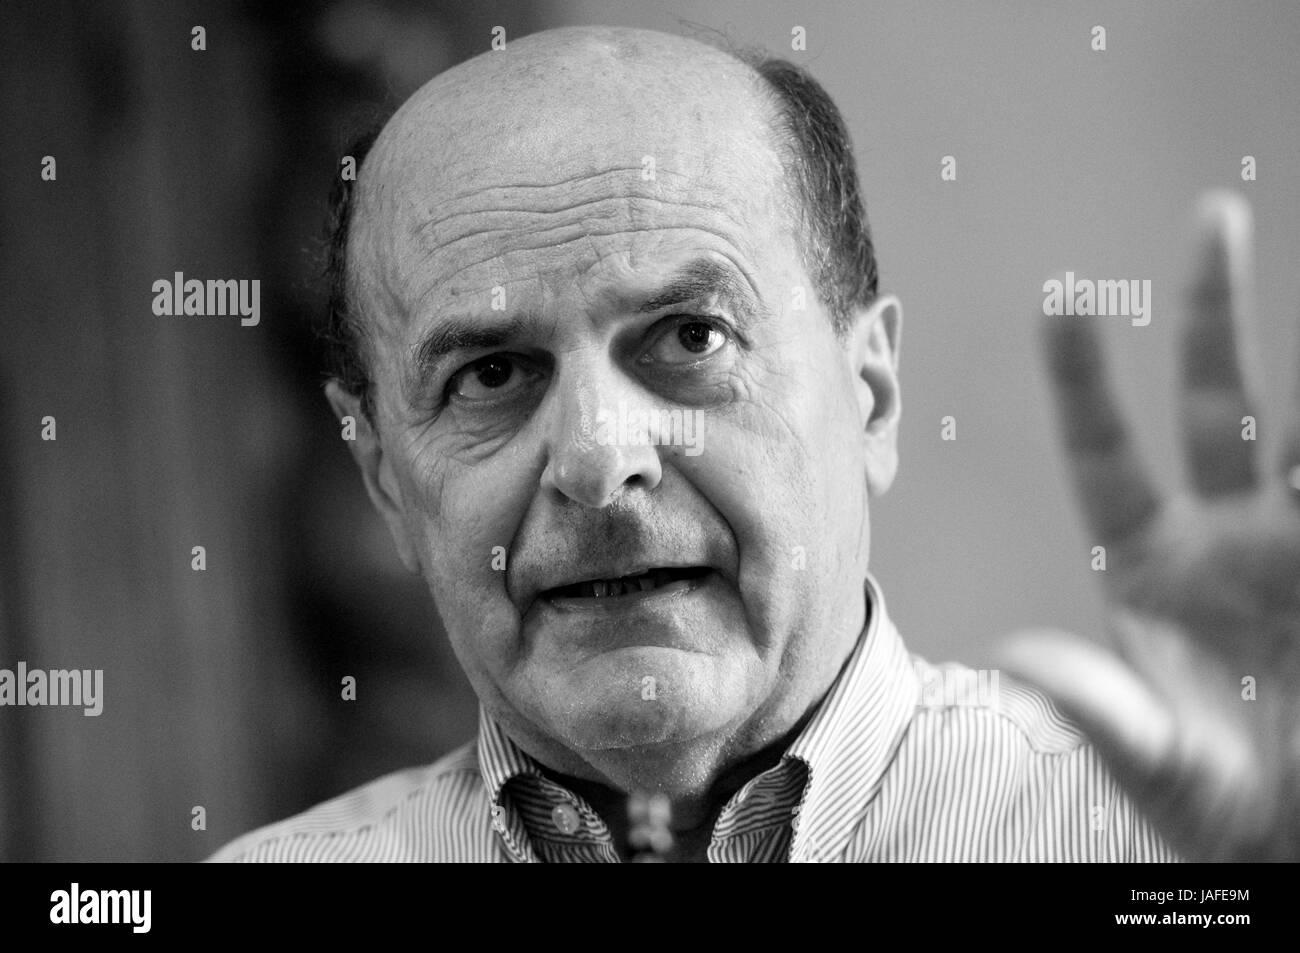 02 June 2017 Italy, Lombardy, Crema, Pier Luigi Bersani an Italian Politician - Stock Image